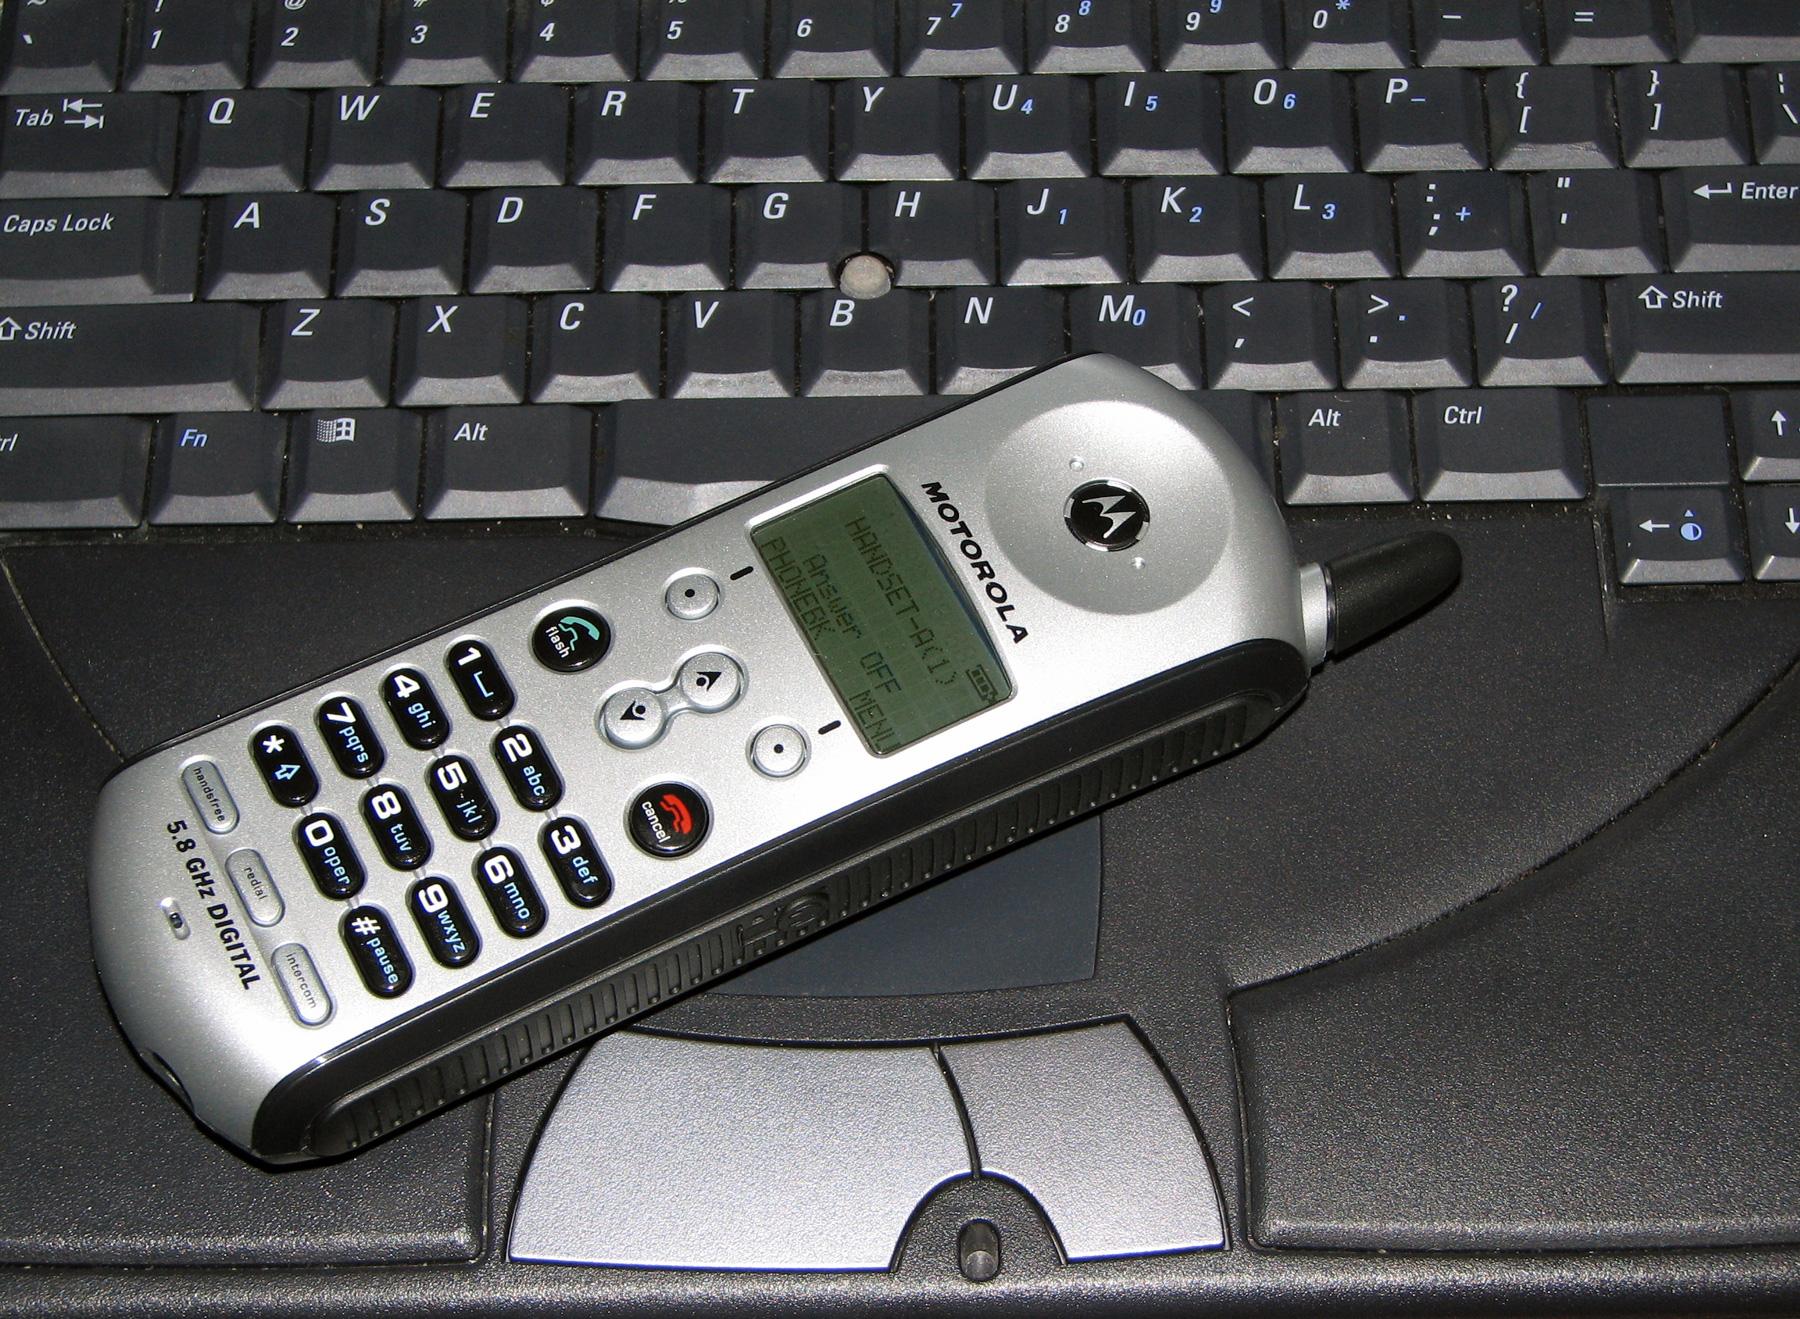 Phone on keyboard, Buttons, Communication, Digital, Keyboard, HQ Photo